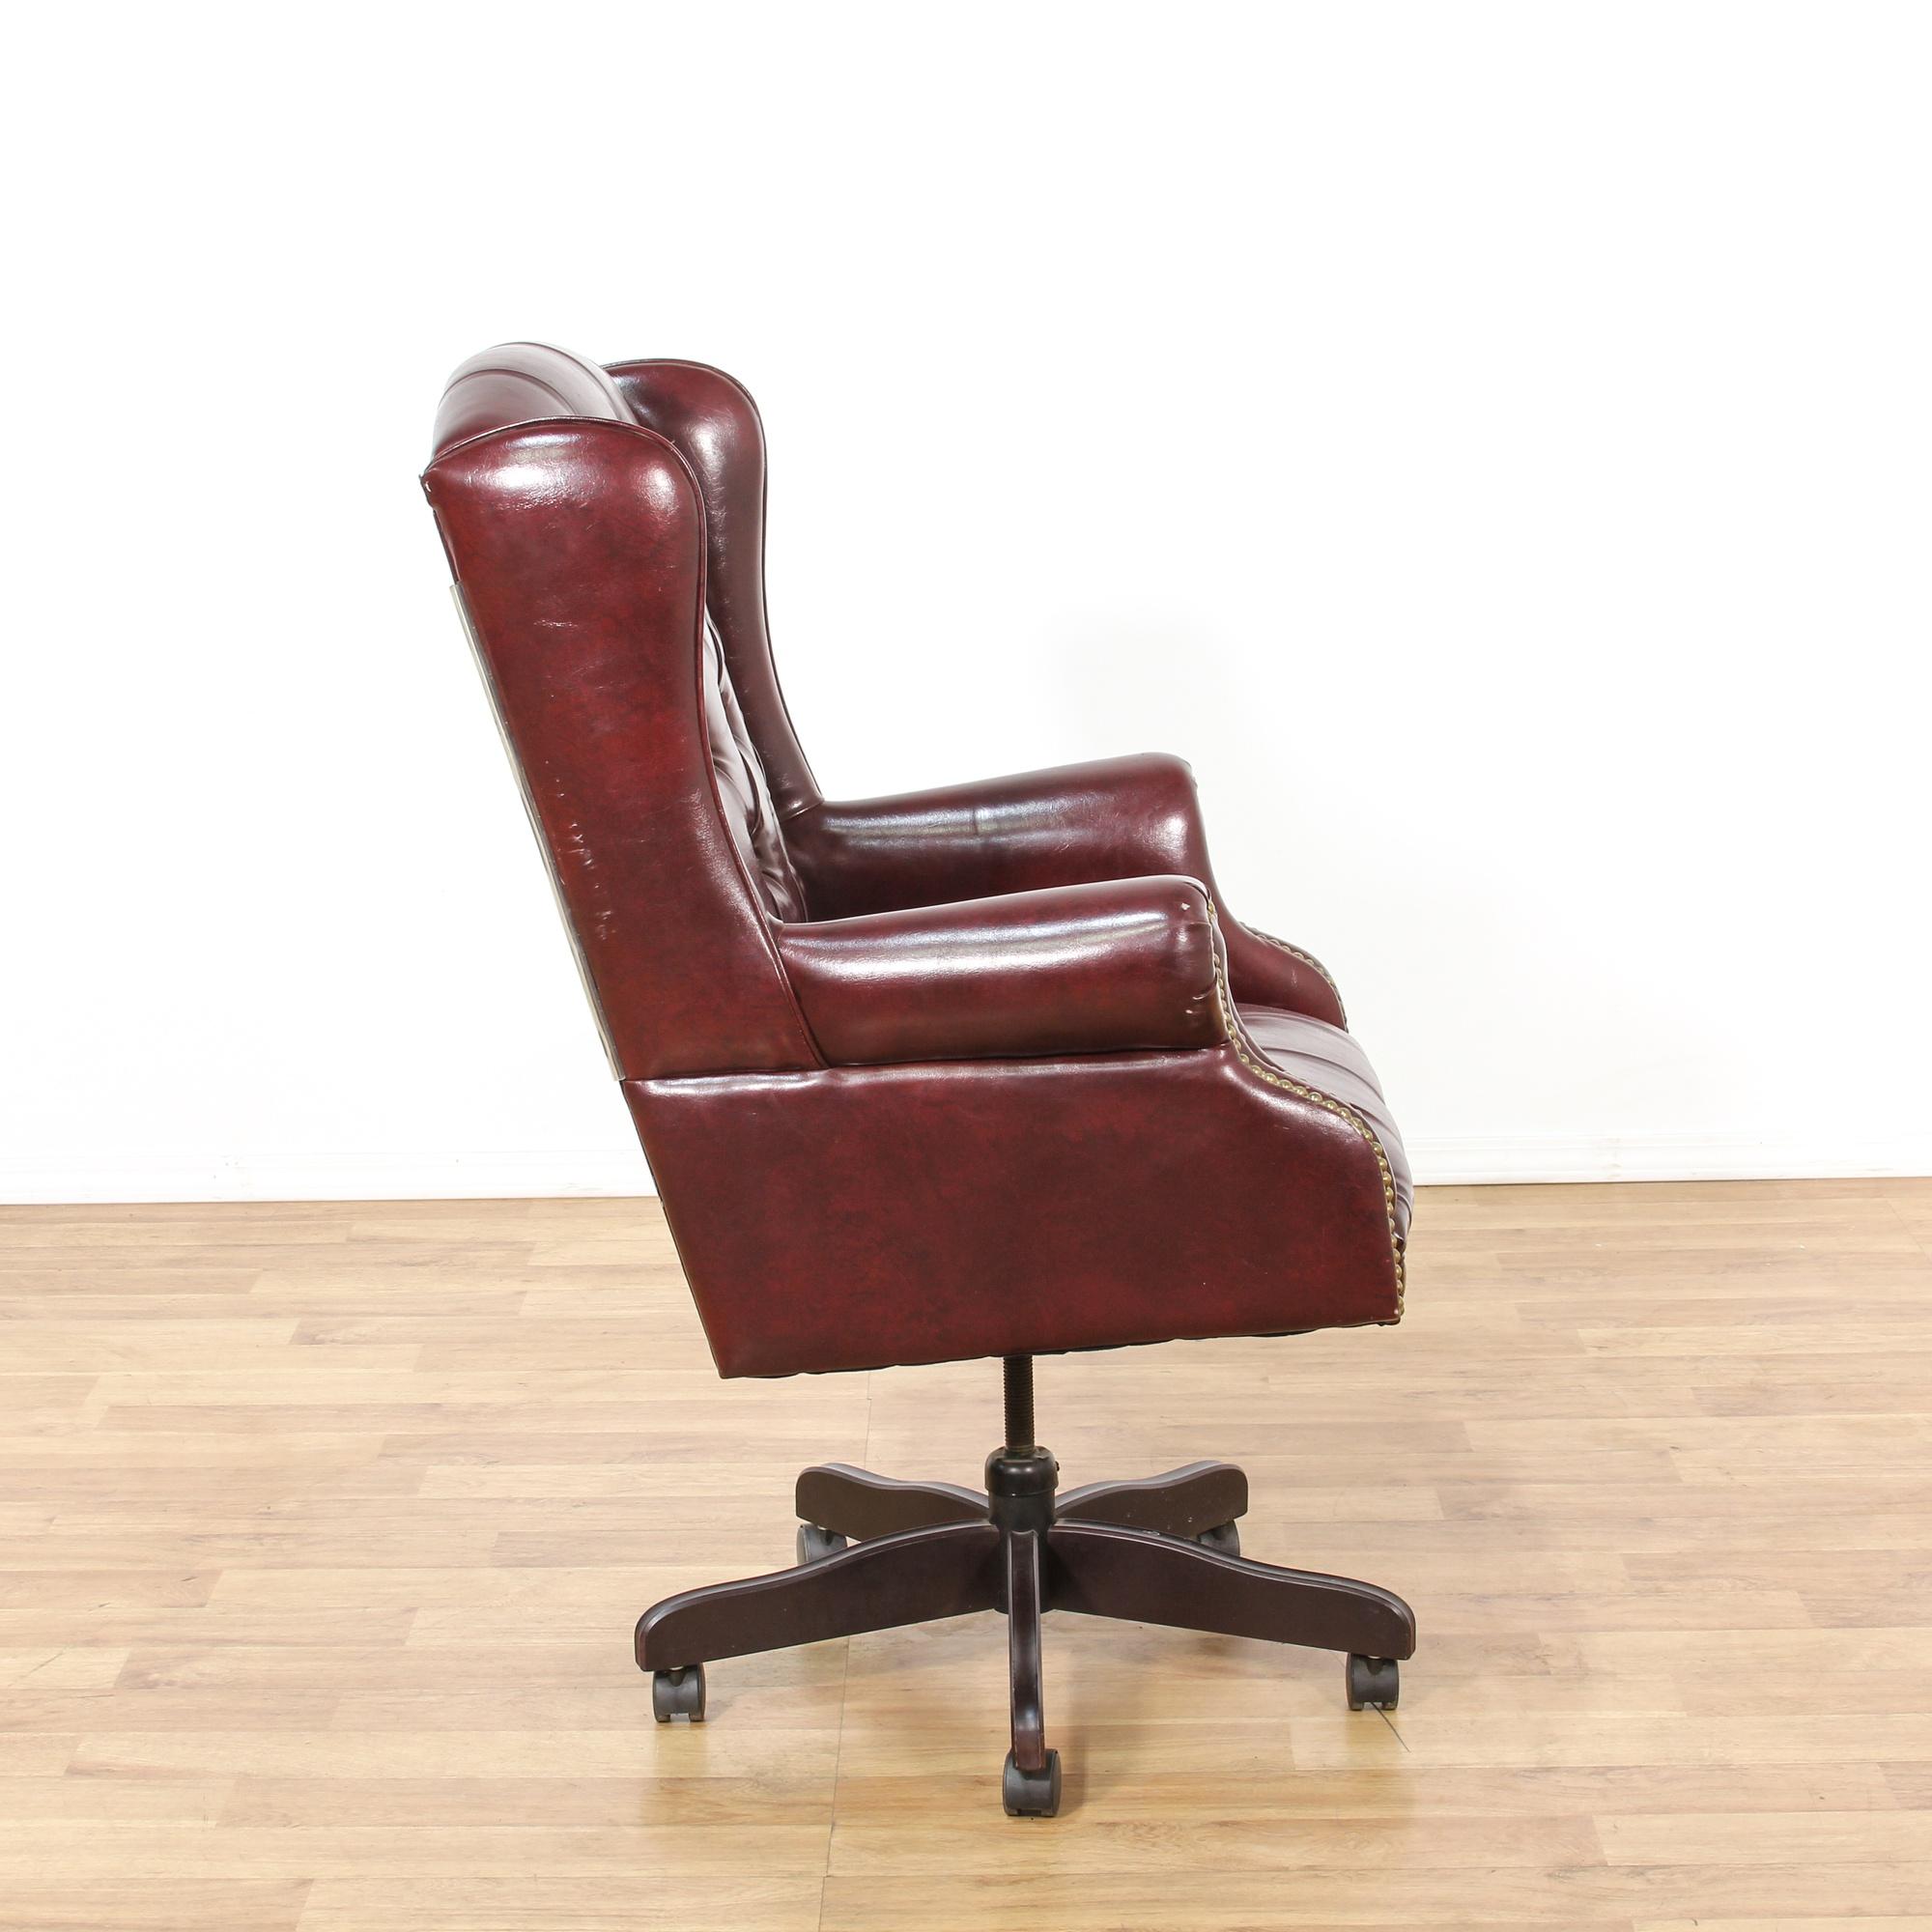 Purple Leather Tufted Executive Chair Loveseat Vintage